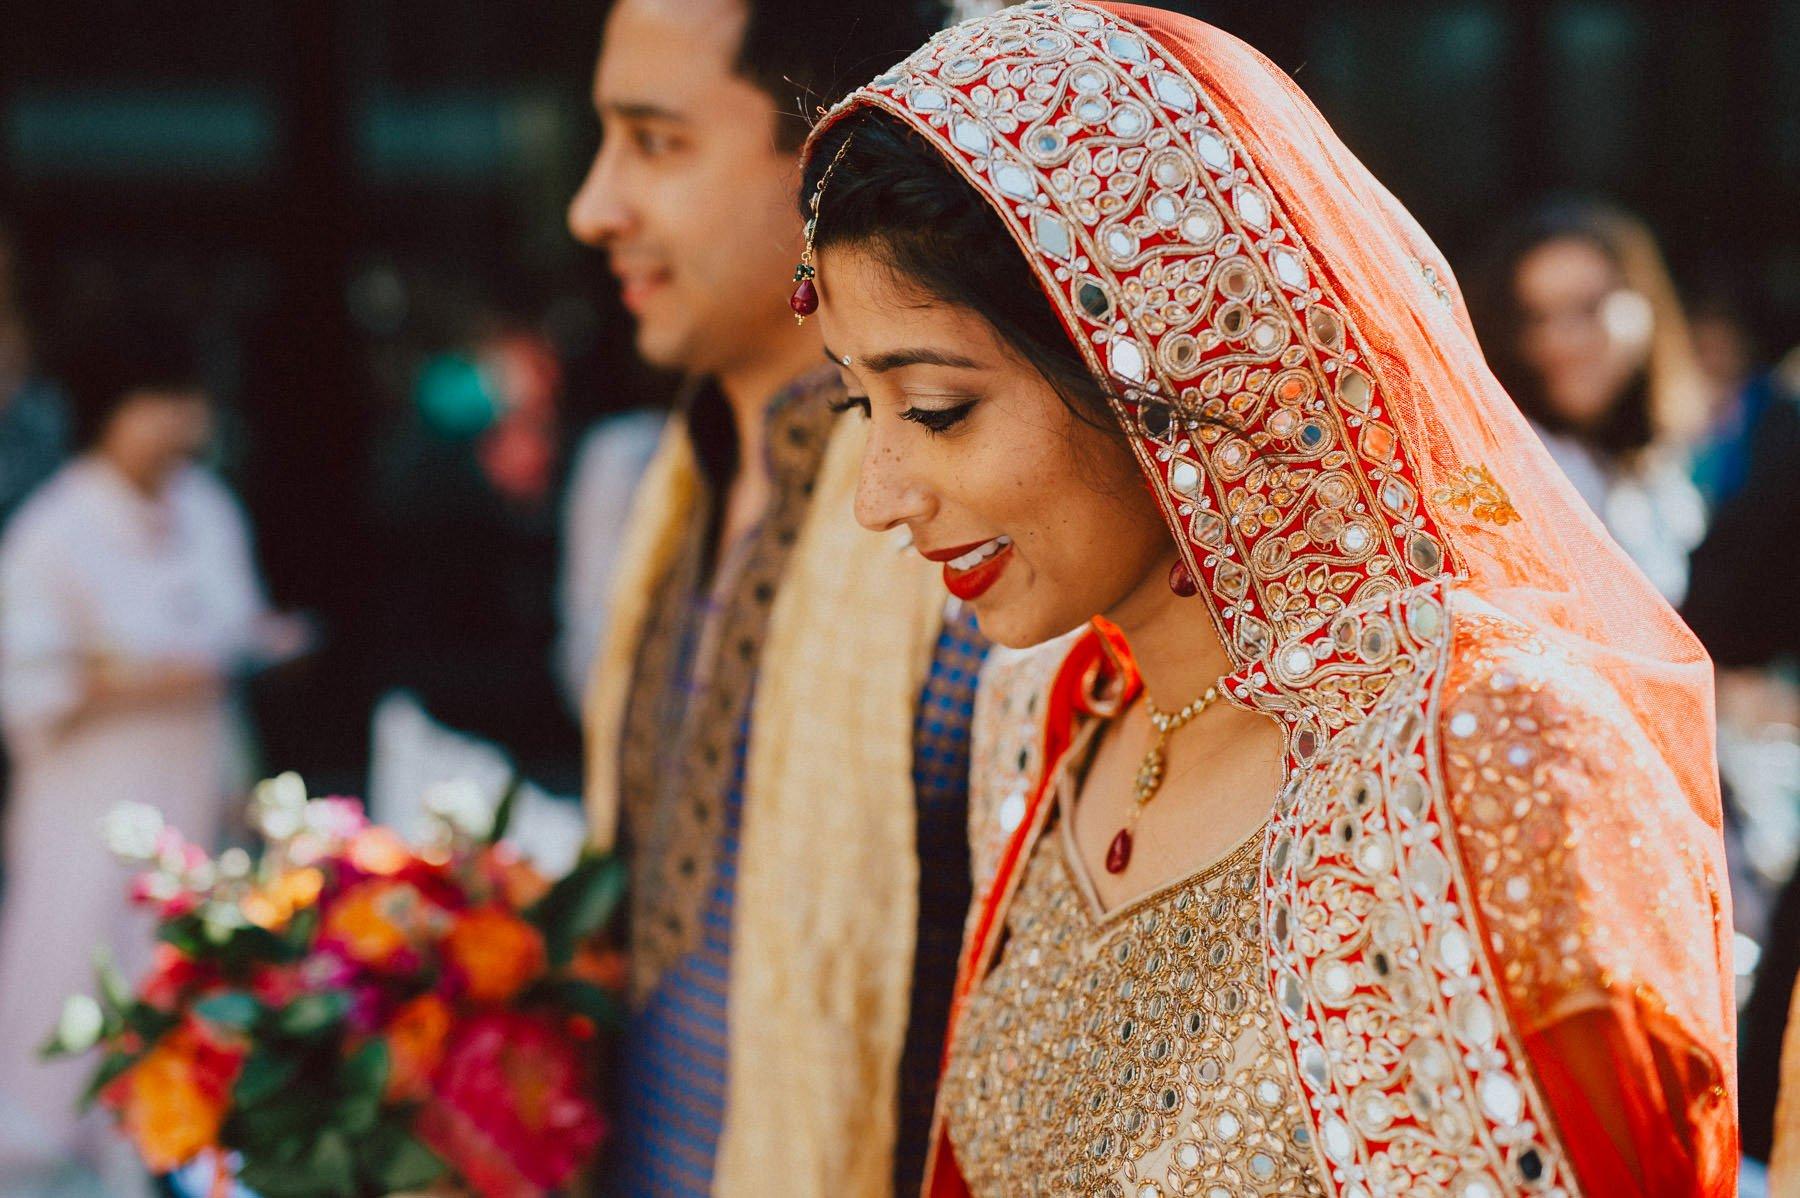 vie-philadelphia-indian-wedding-76.jpg